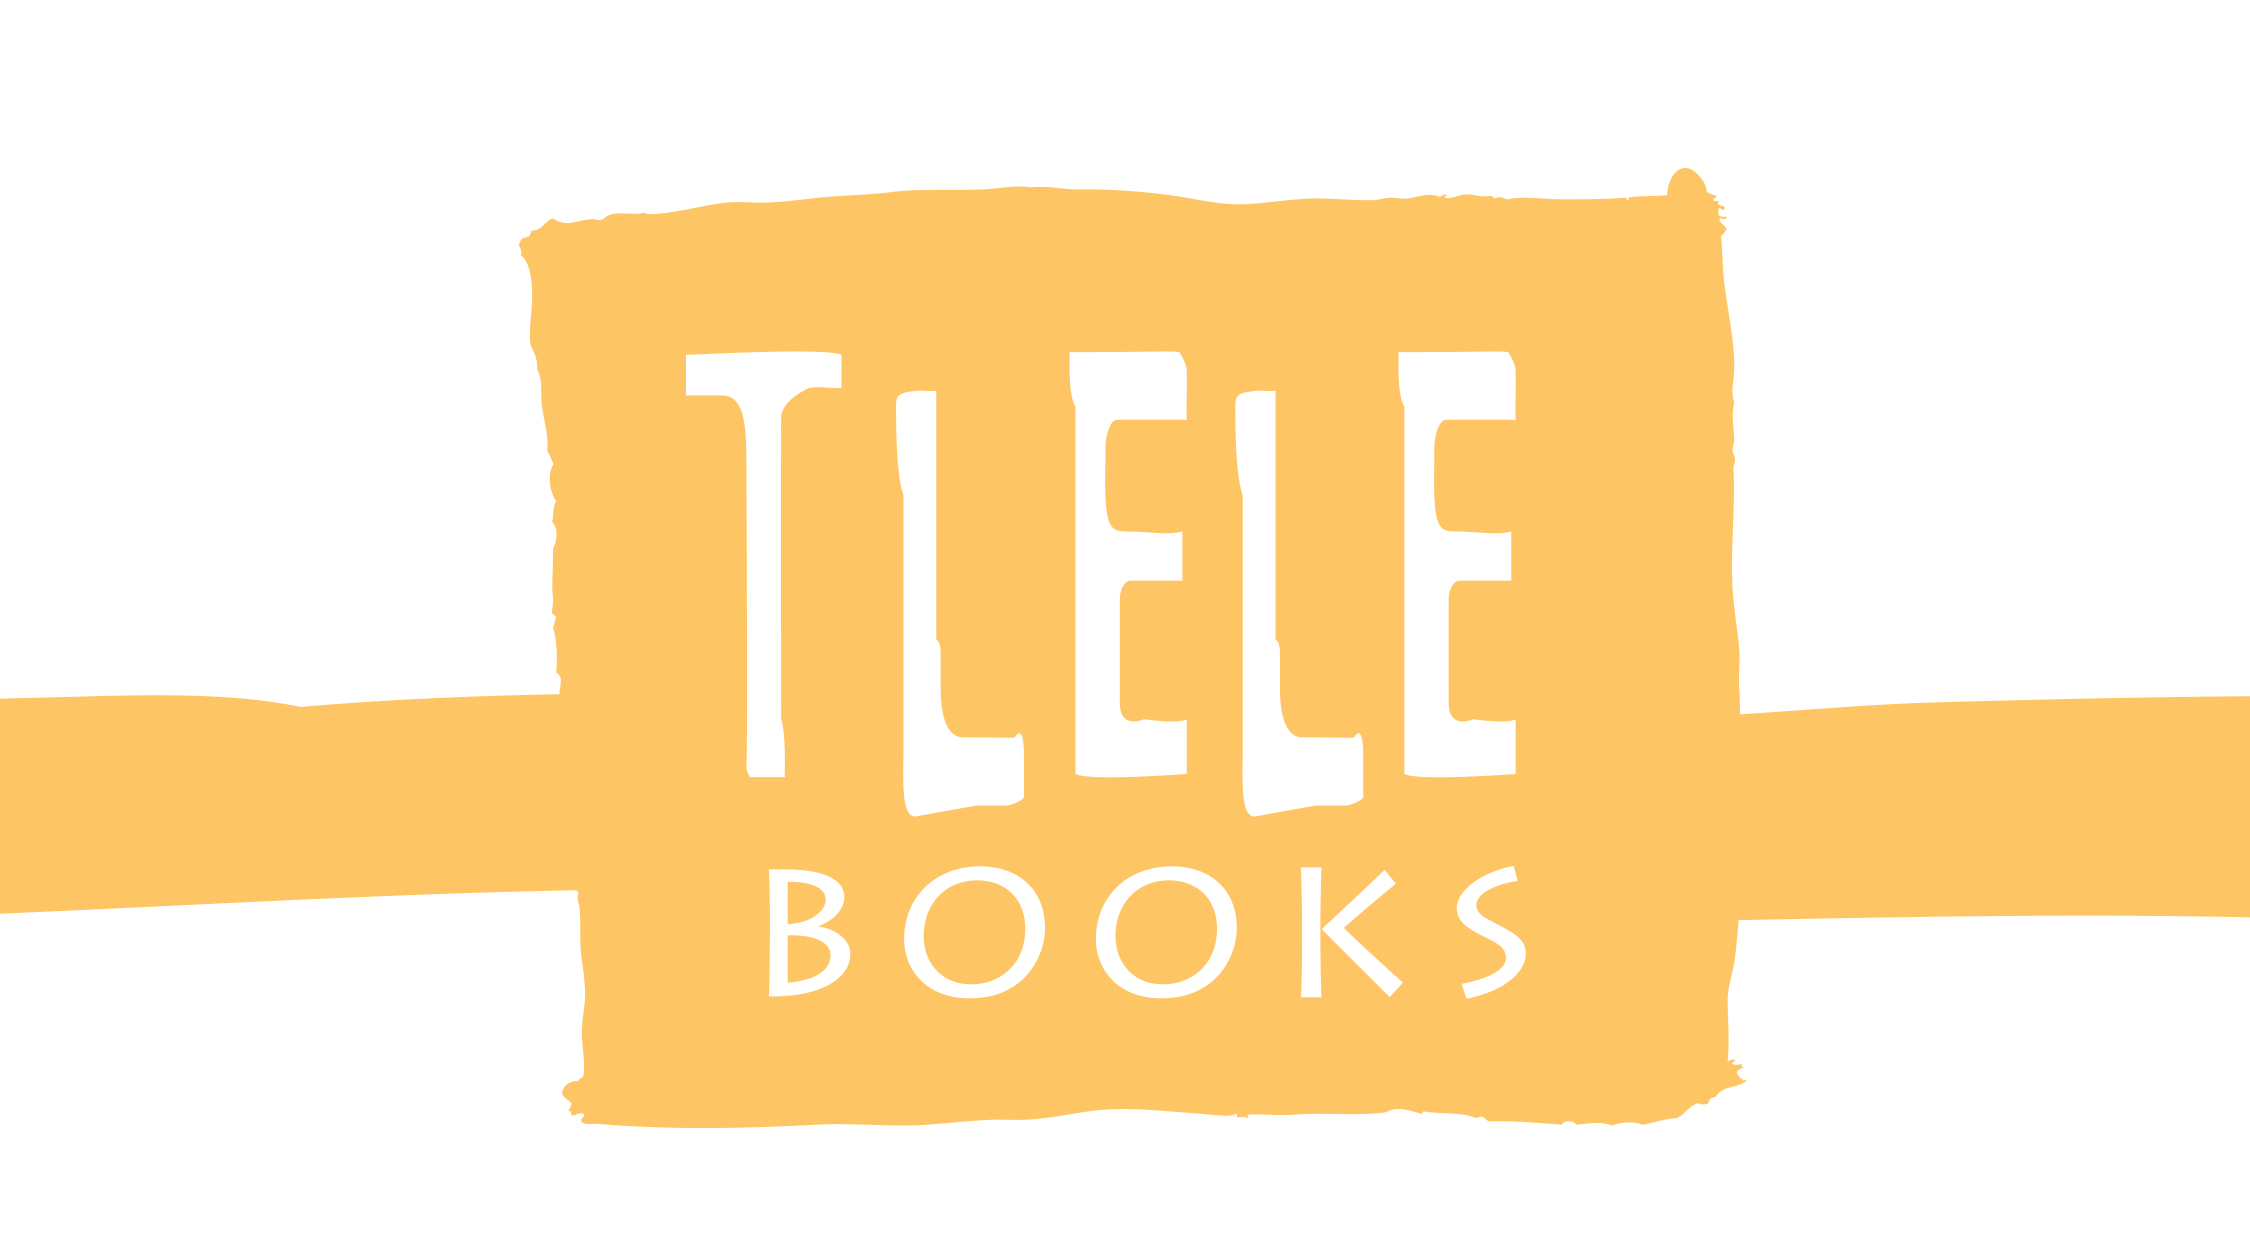 Tlelebooks Verlag